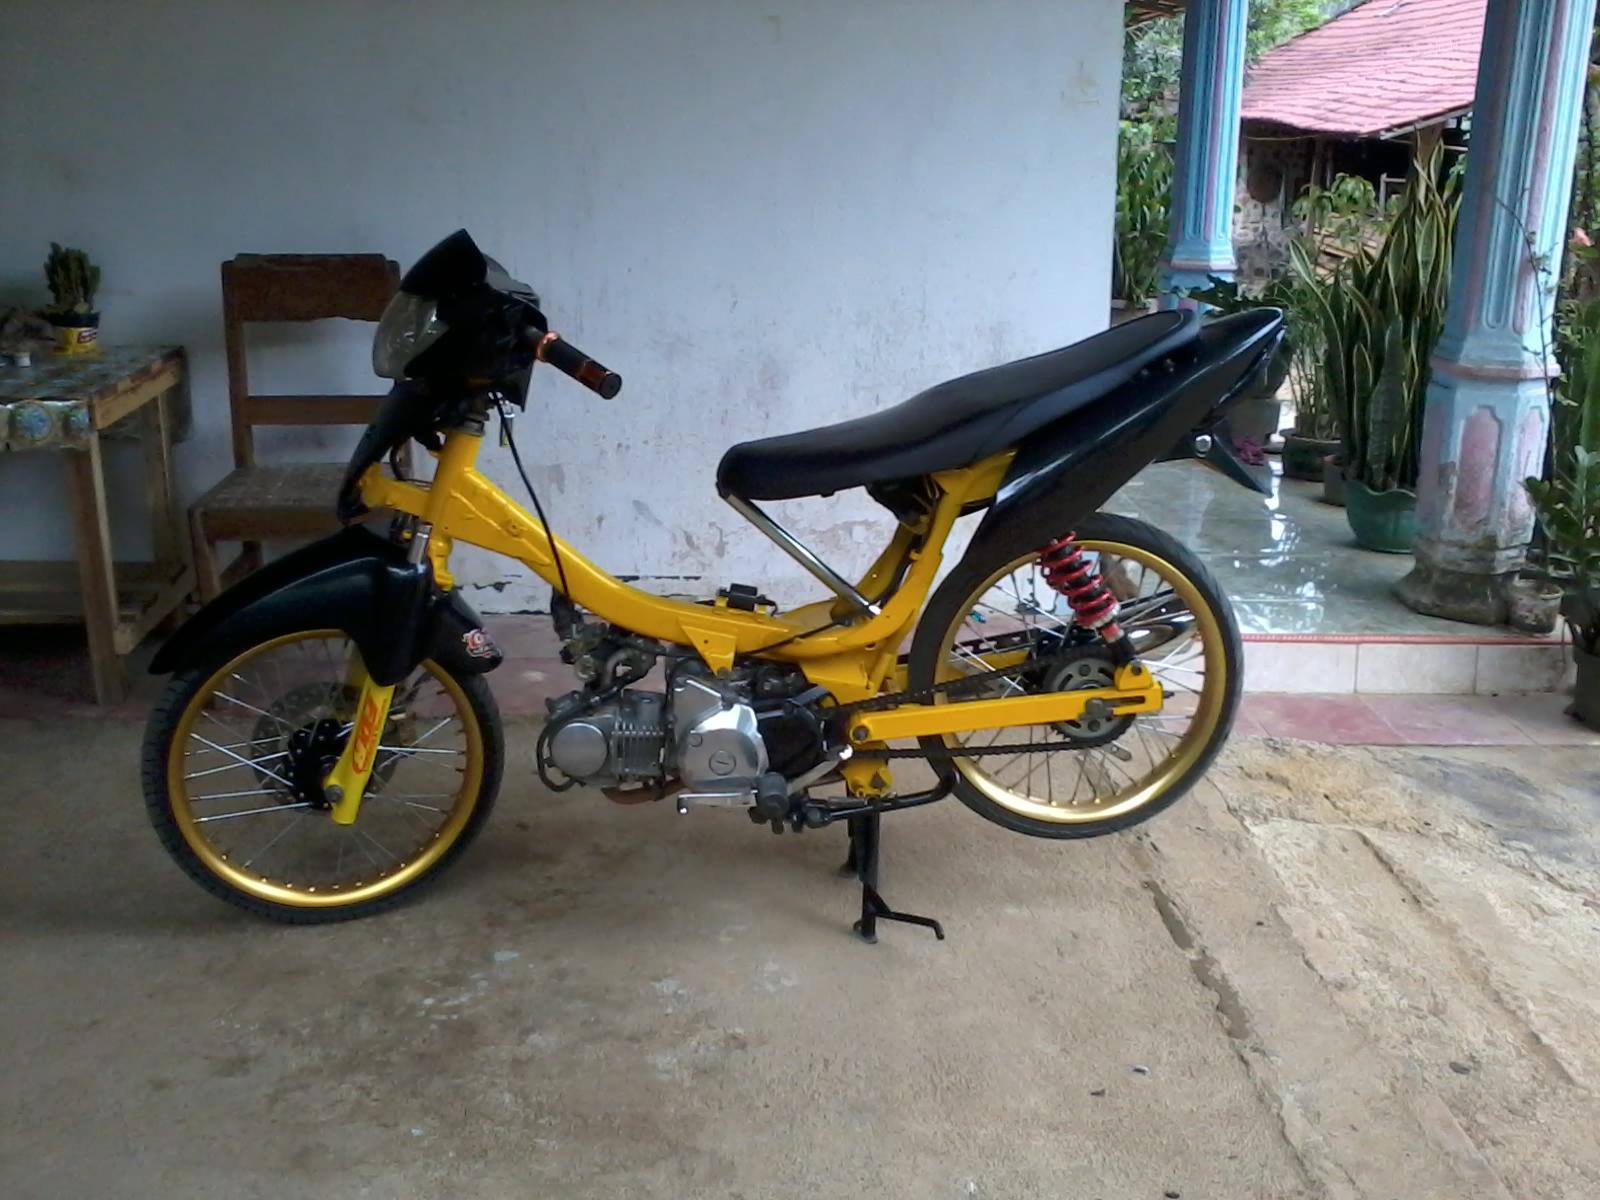 Honda-supra-x-125-pgm-fi-new-king-motor-jual-beli-motor